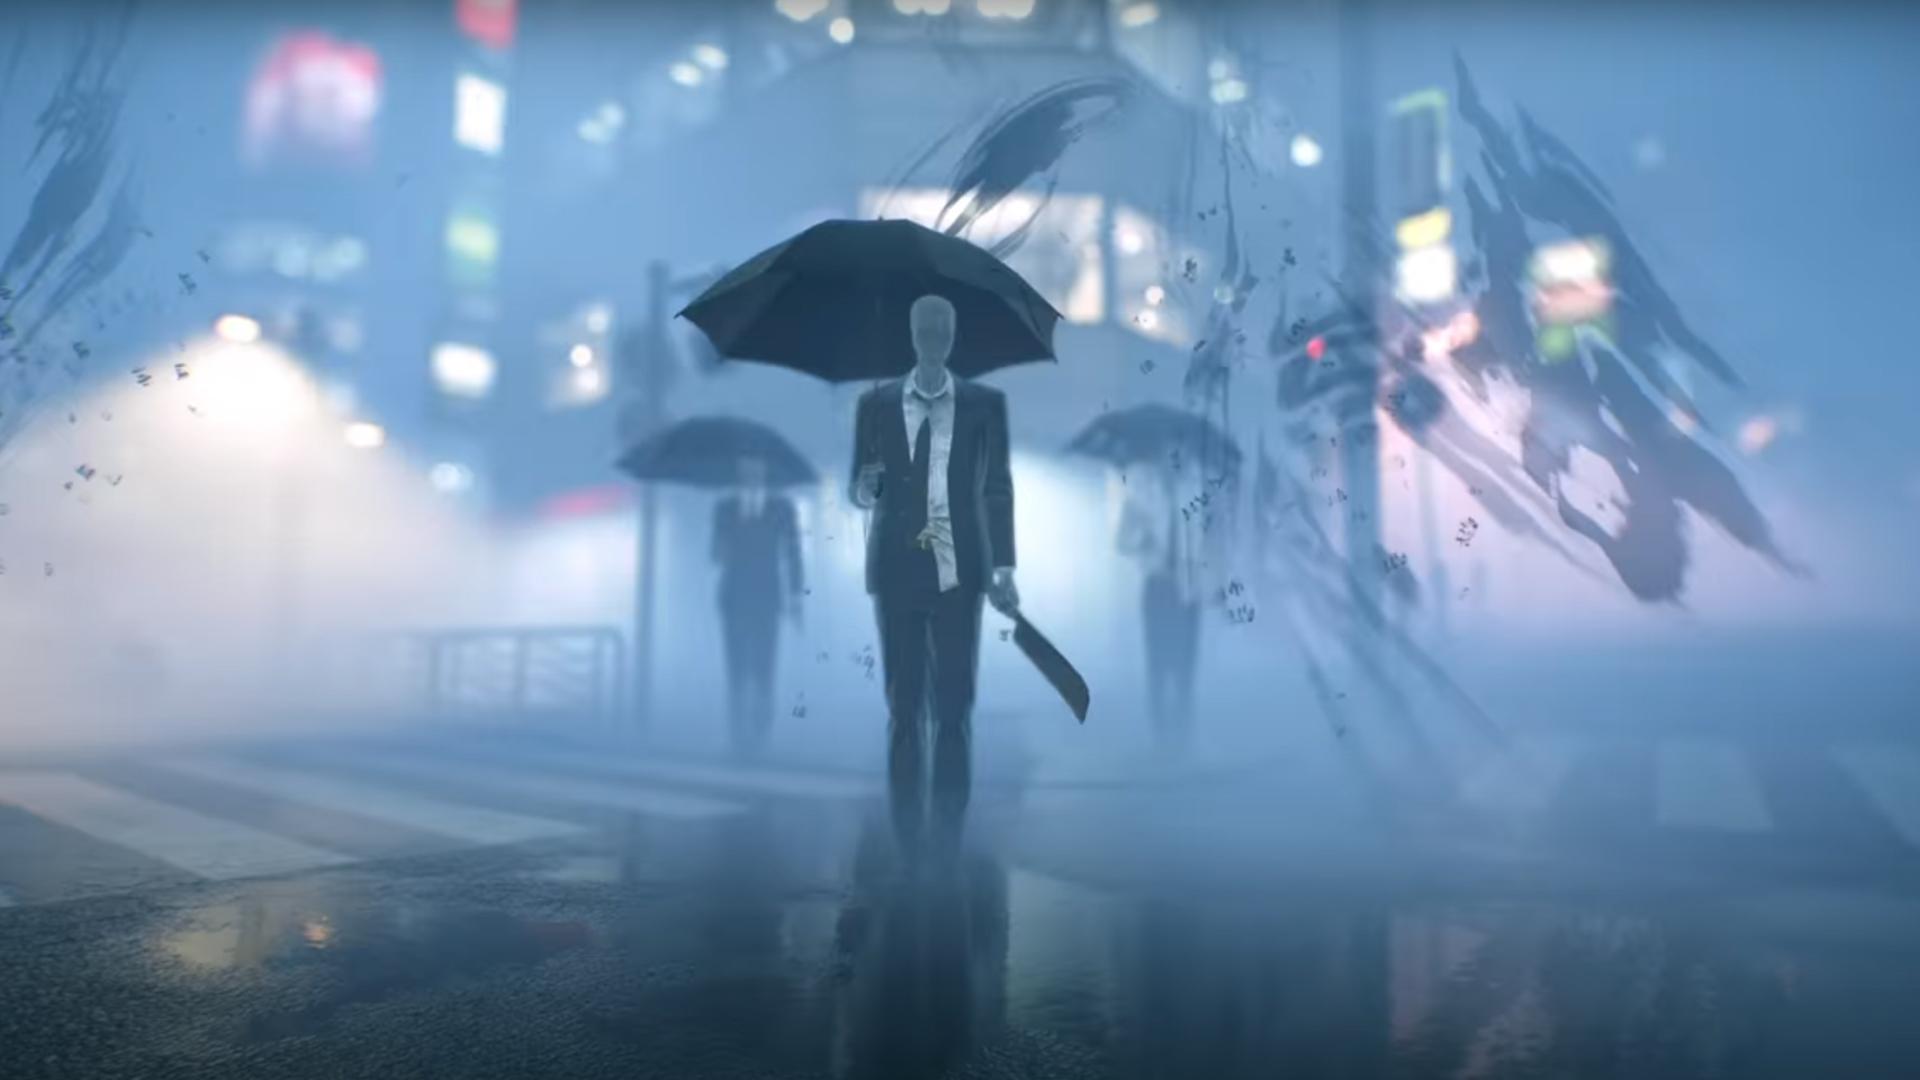 ghostwire salary men parapluie